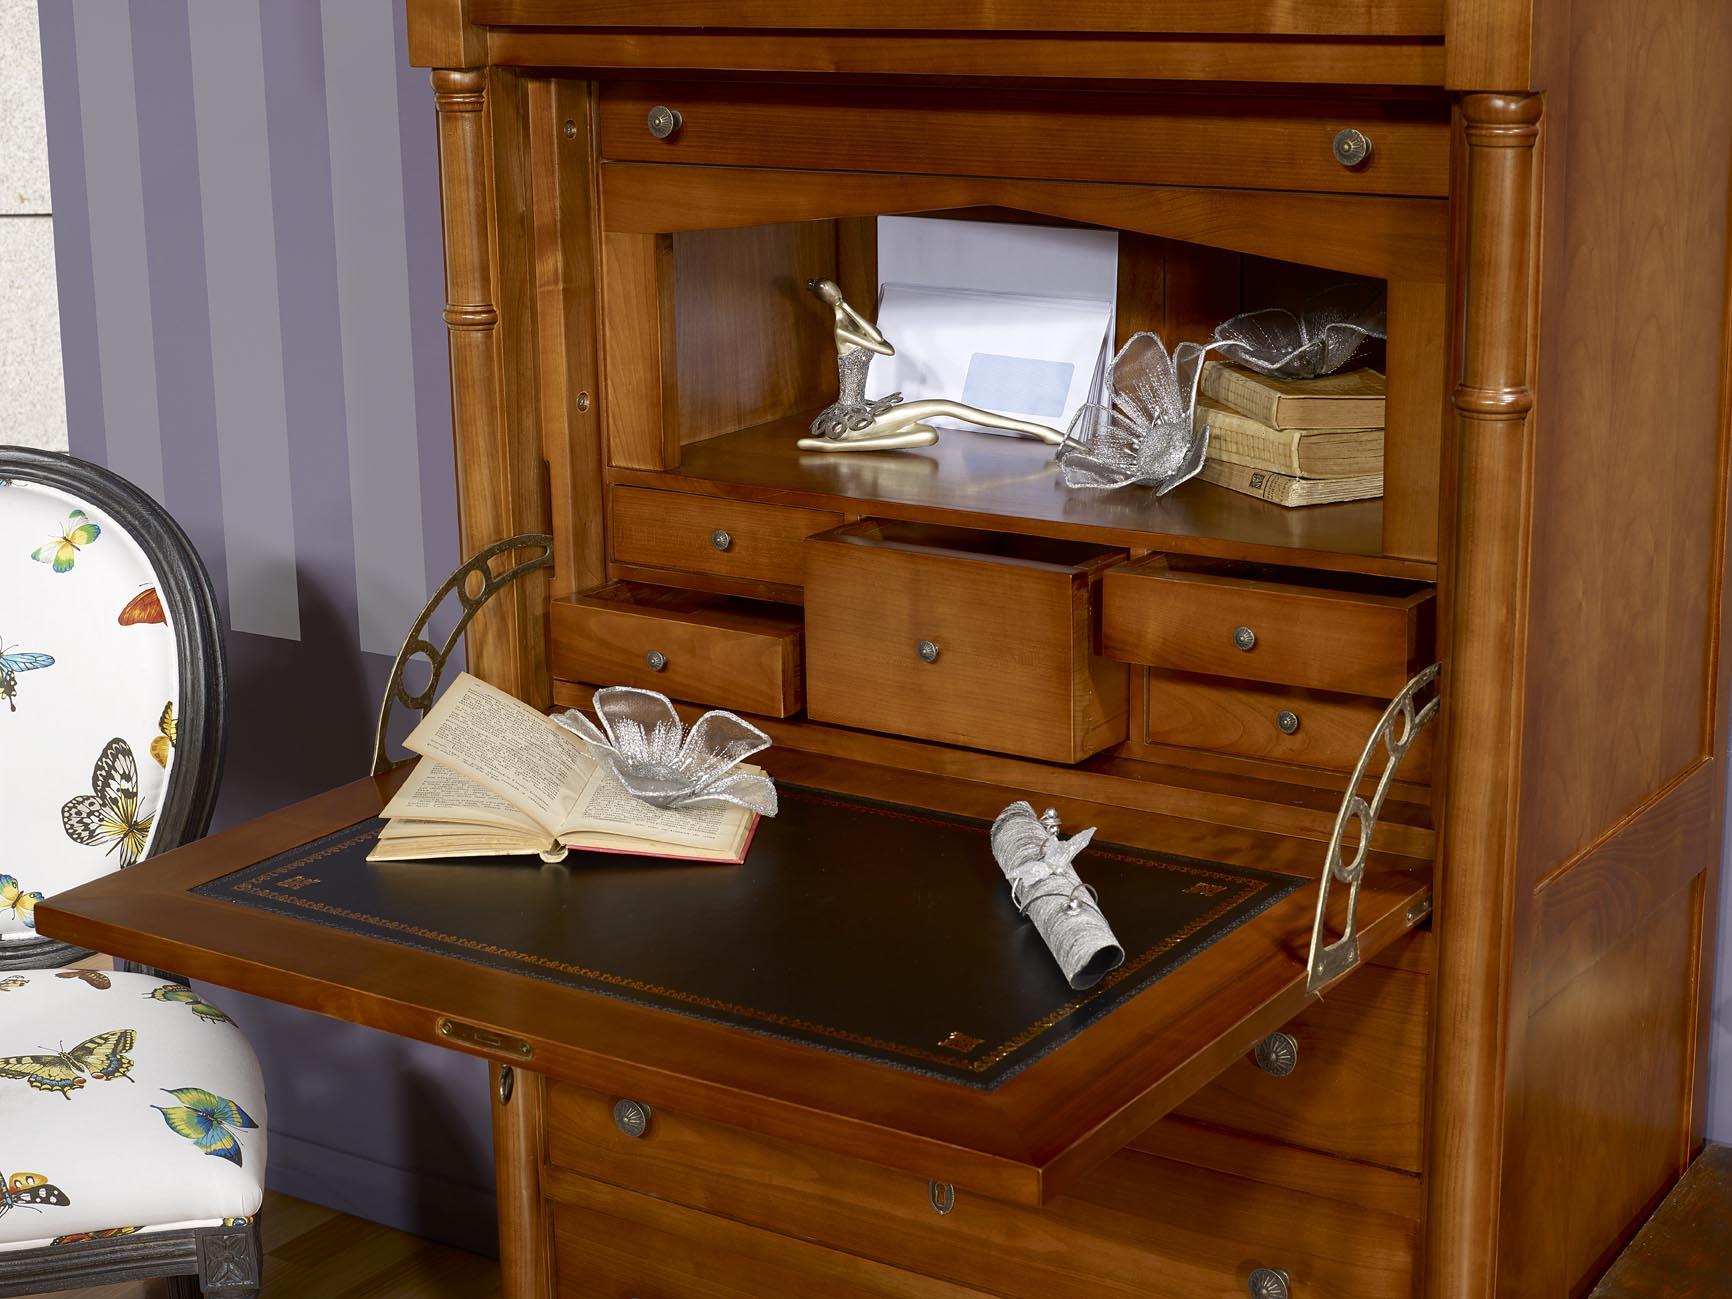 meuble secr taire elise en merisier de style empire meuble en merisier. Black Bedroom Furniture Sets. Home Design Ideas